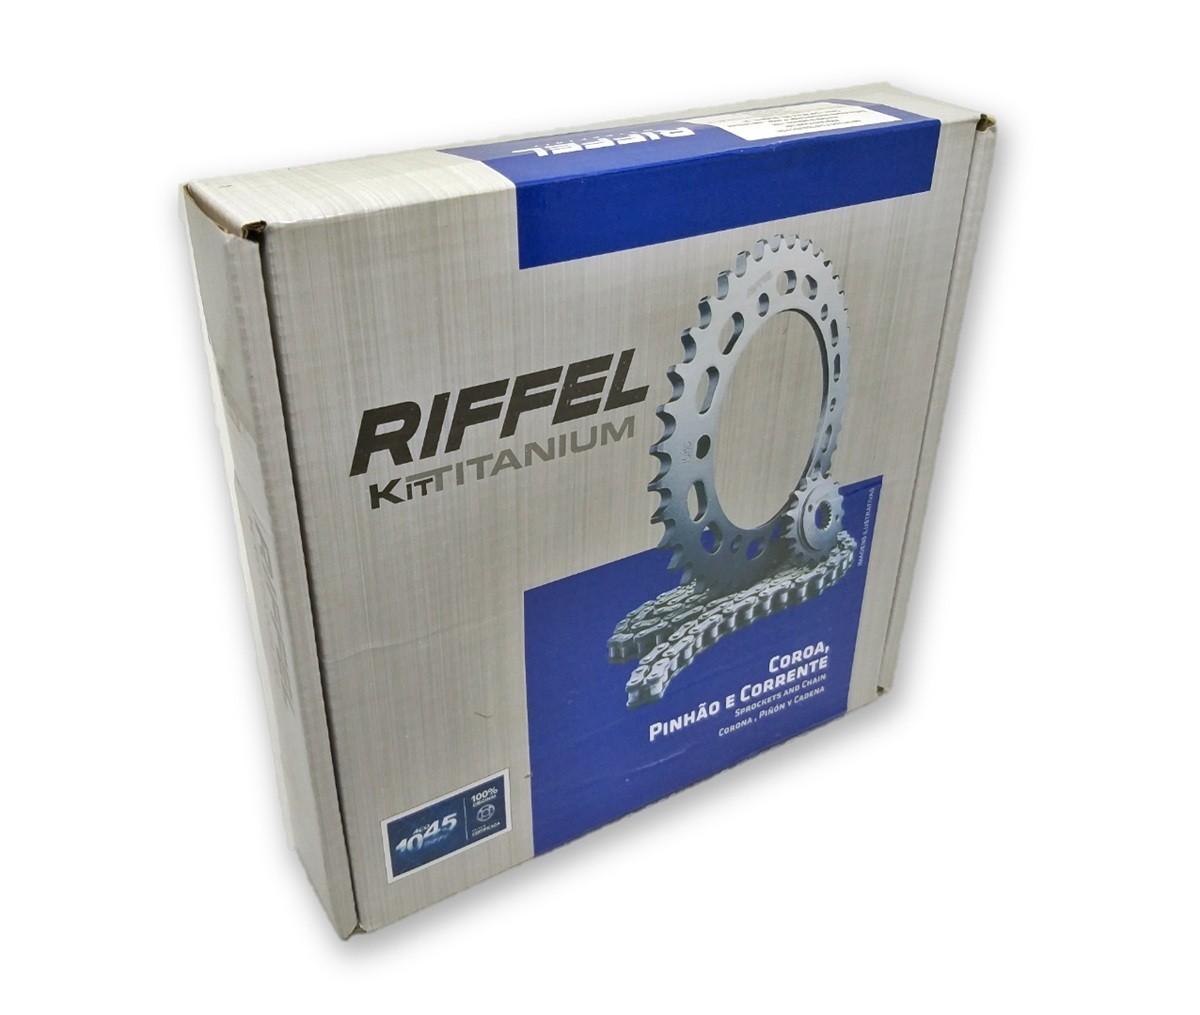 Kit Relação Titan 150 / Fan 150 Titanium Aço 1045 Riffel 428x118x43x16